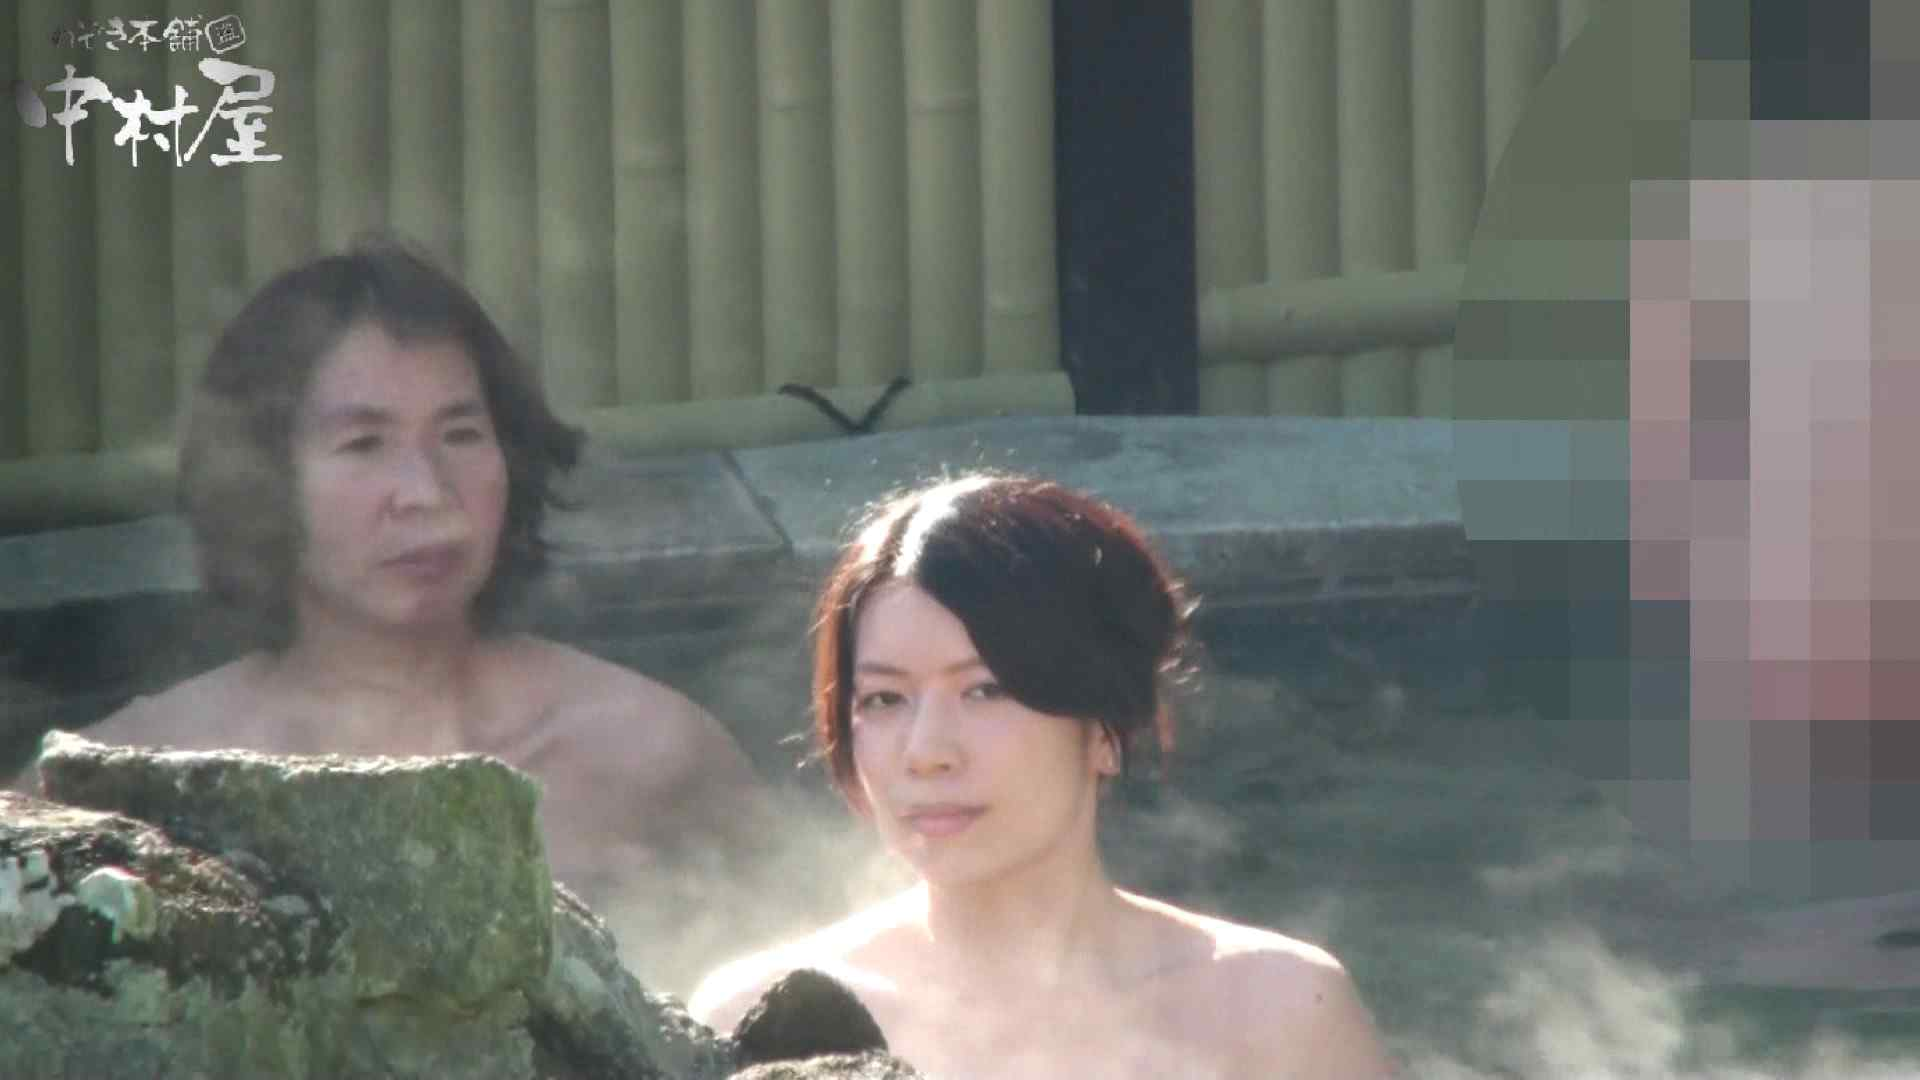 Aquaな露天風呂Vol.919 盗撮 おまんこ無修正動画無料 91連発 44